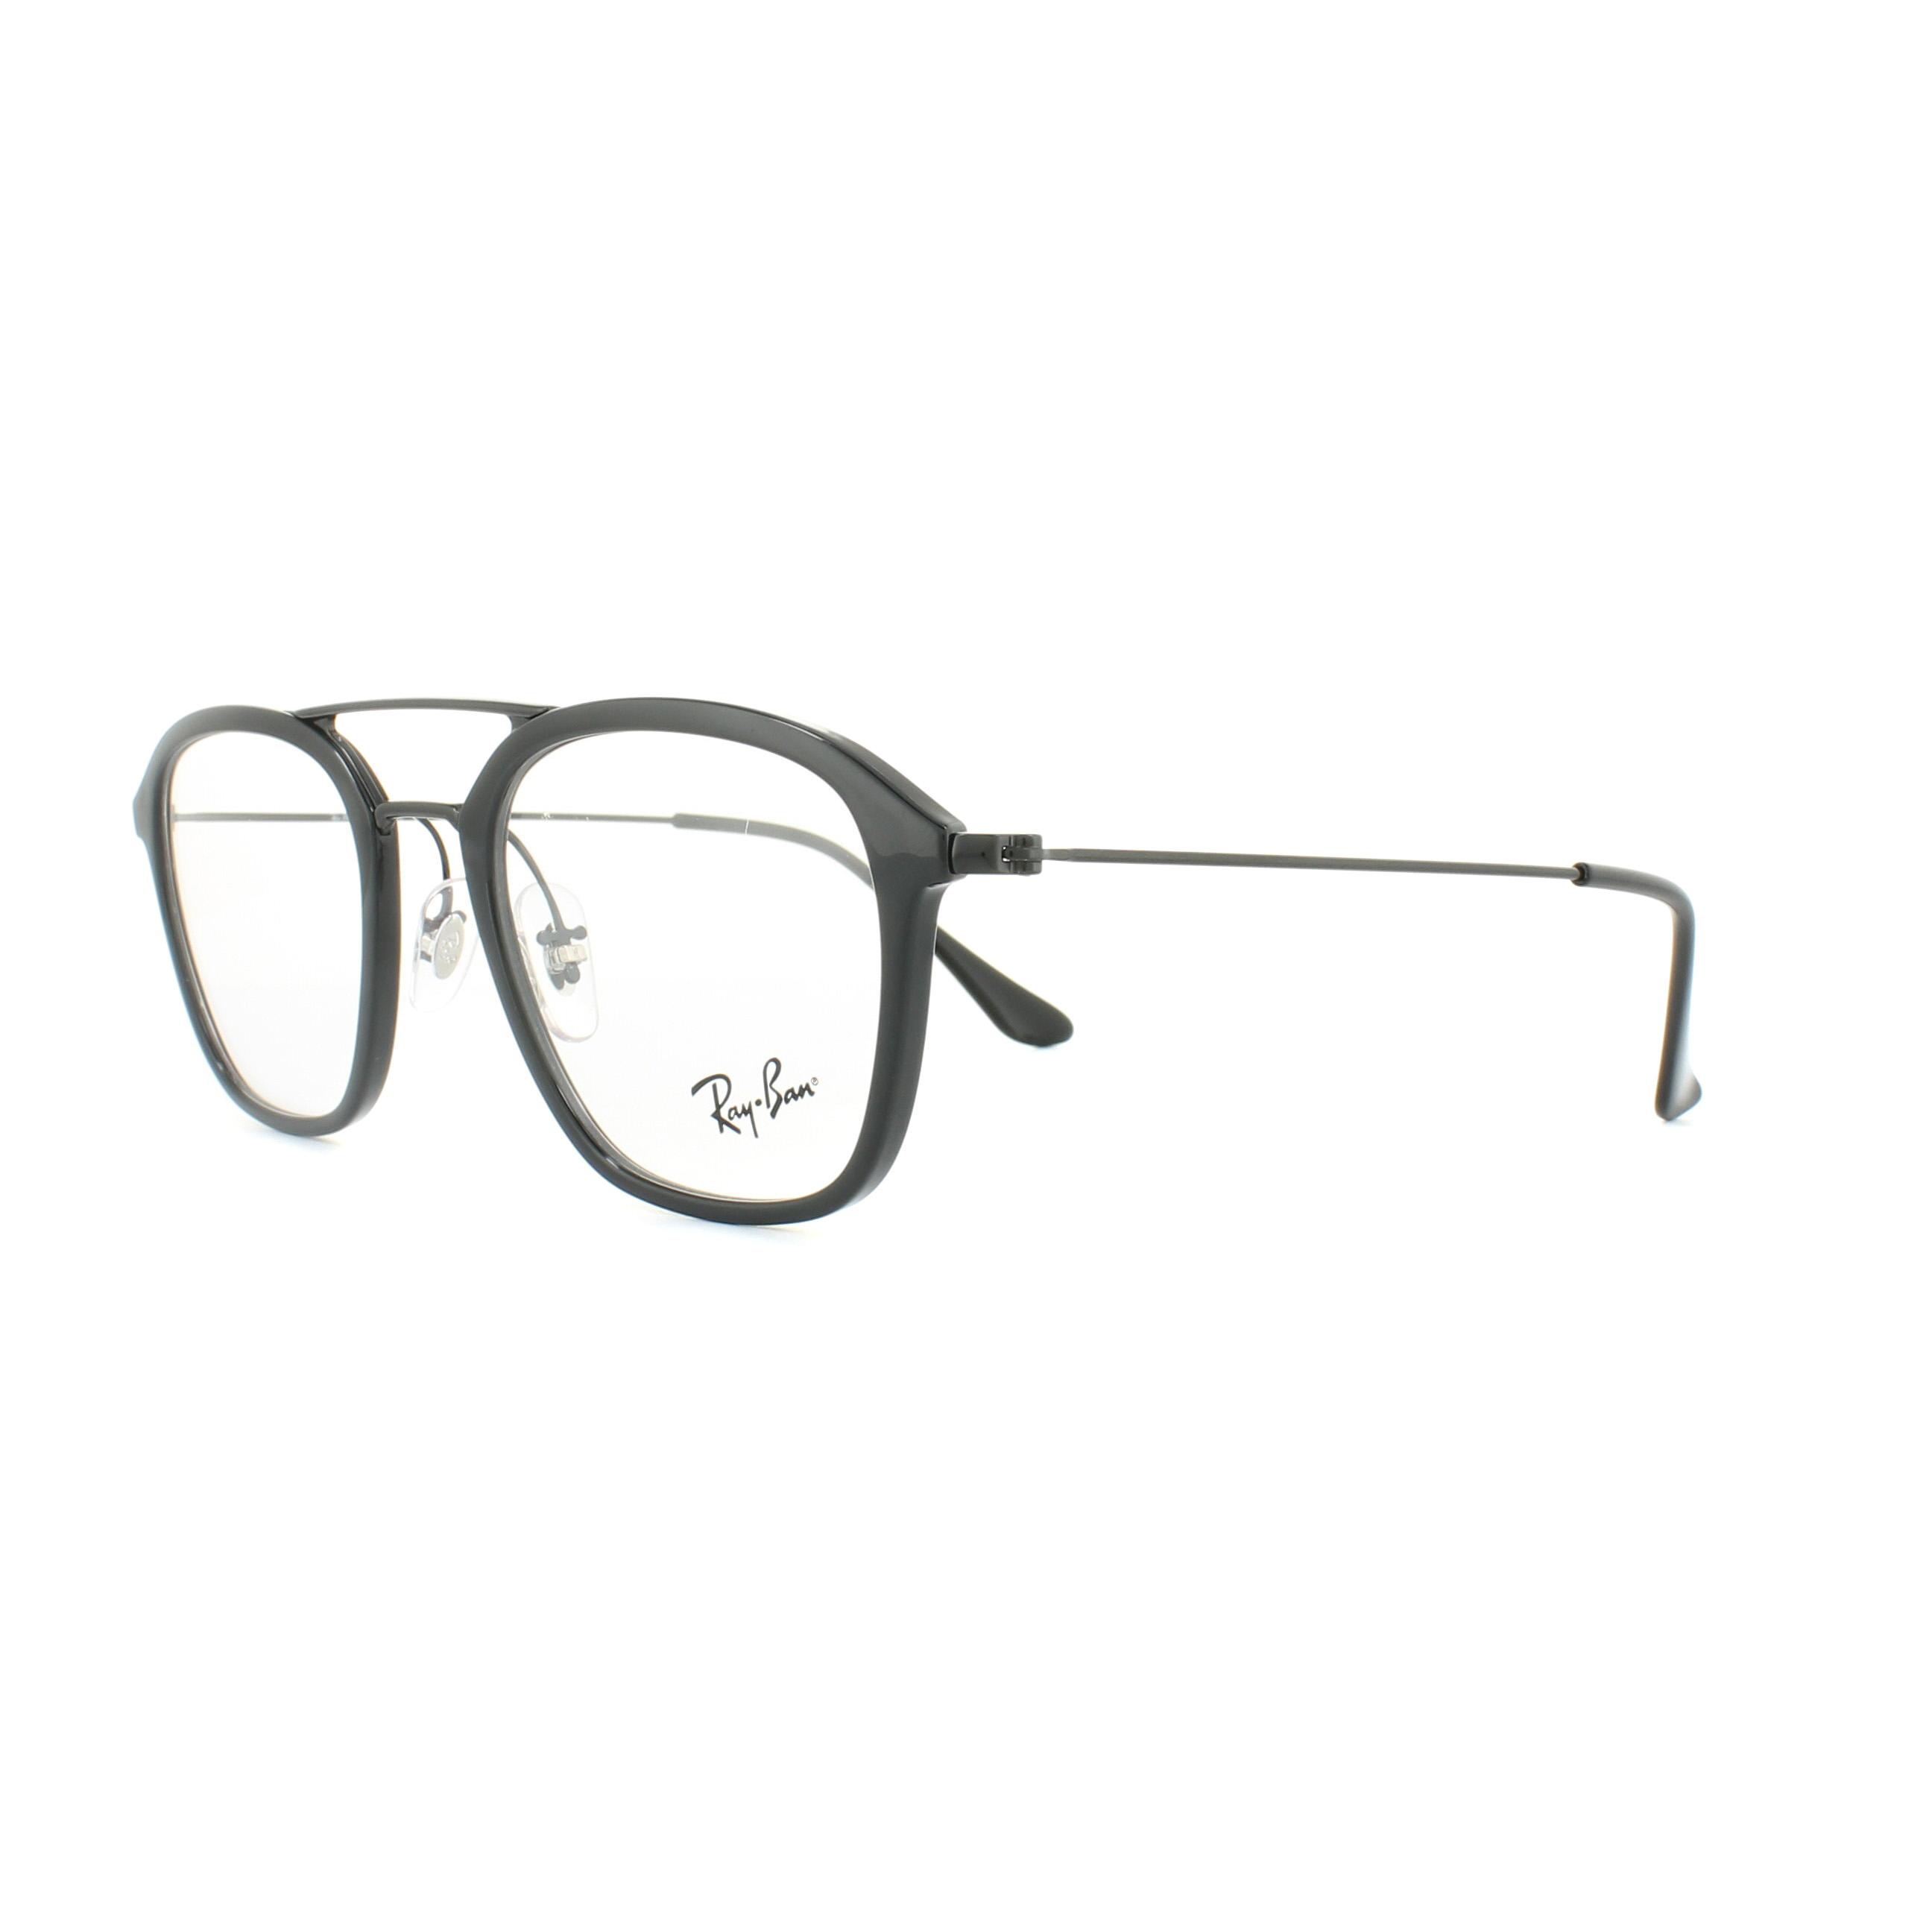 b03d47dd5c Ray-Ban Glasses Frames 7098 5725 Black 50mm Mens 8053672783650